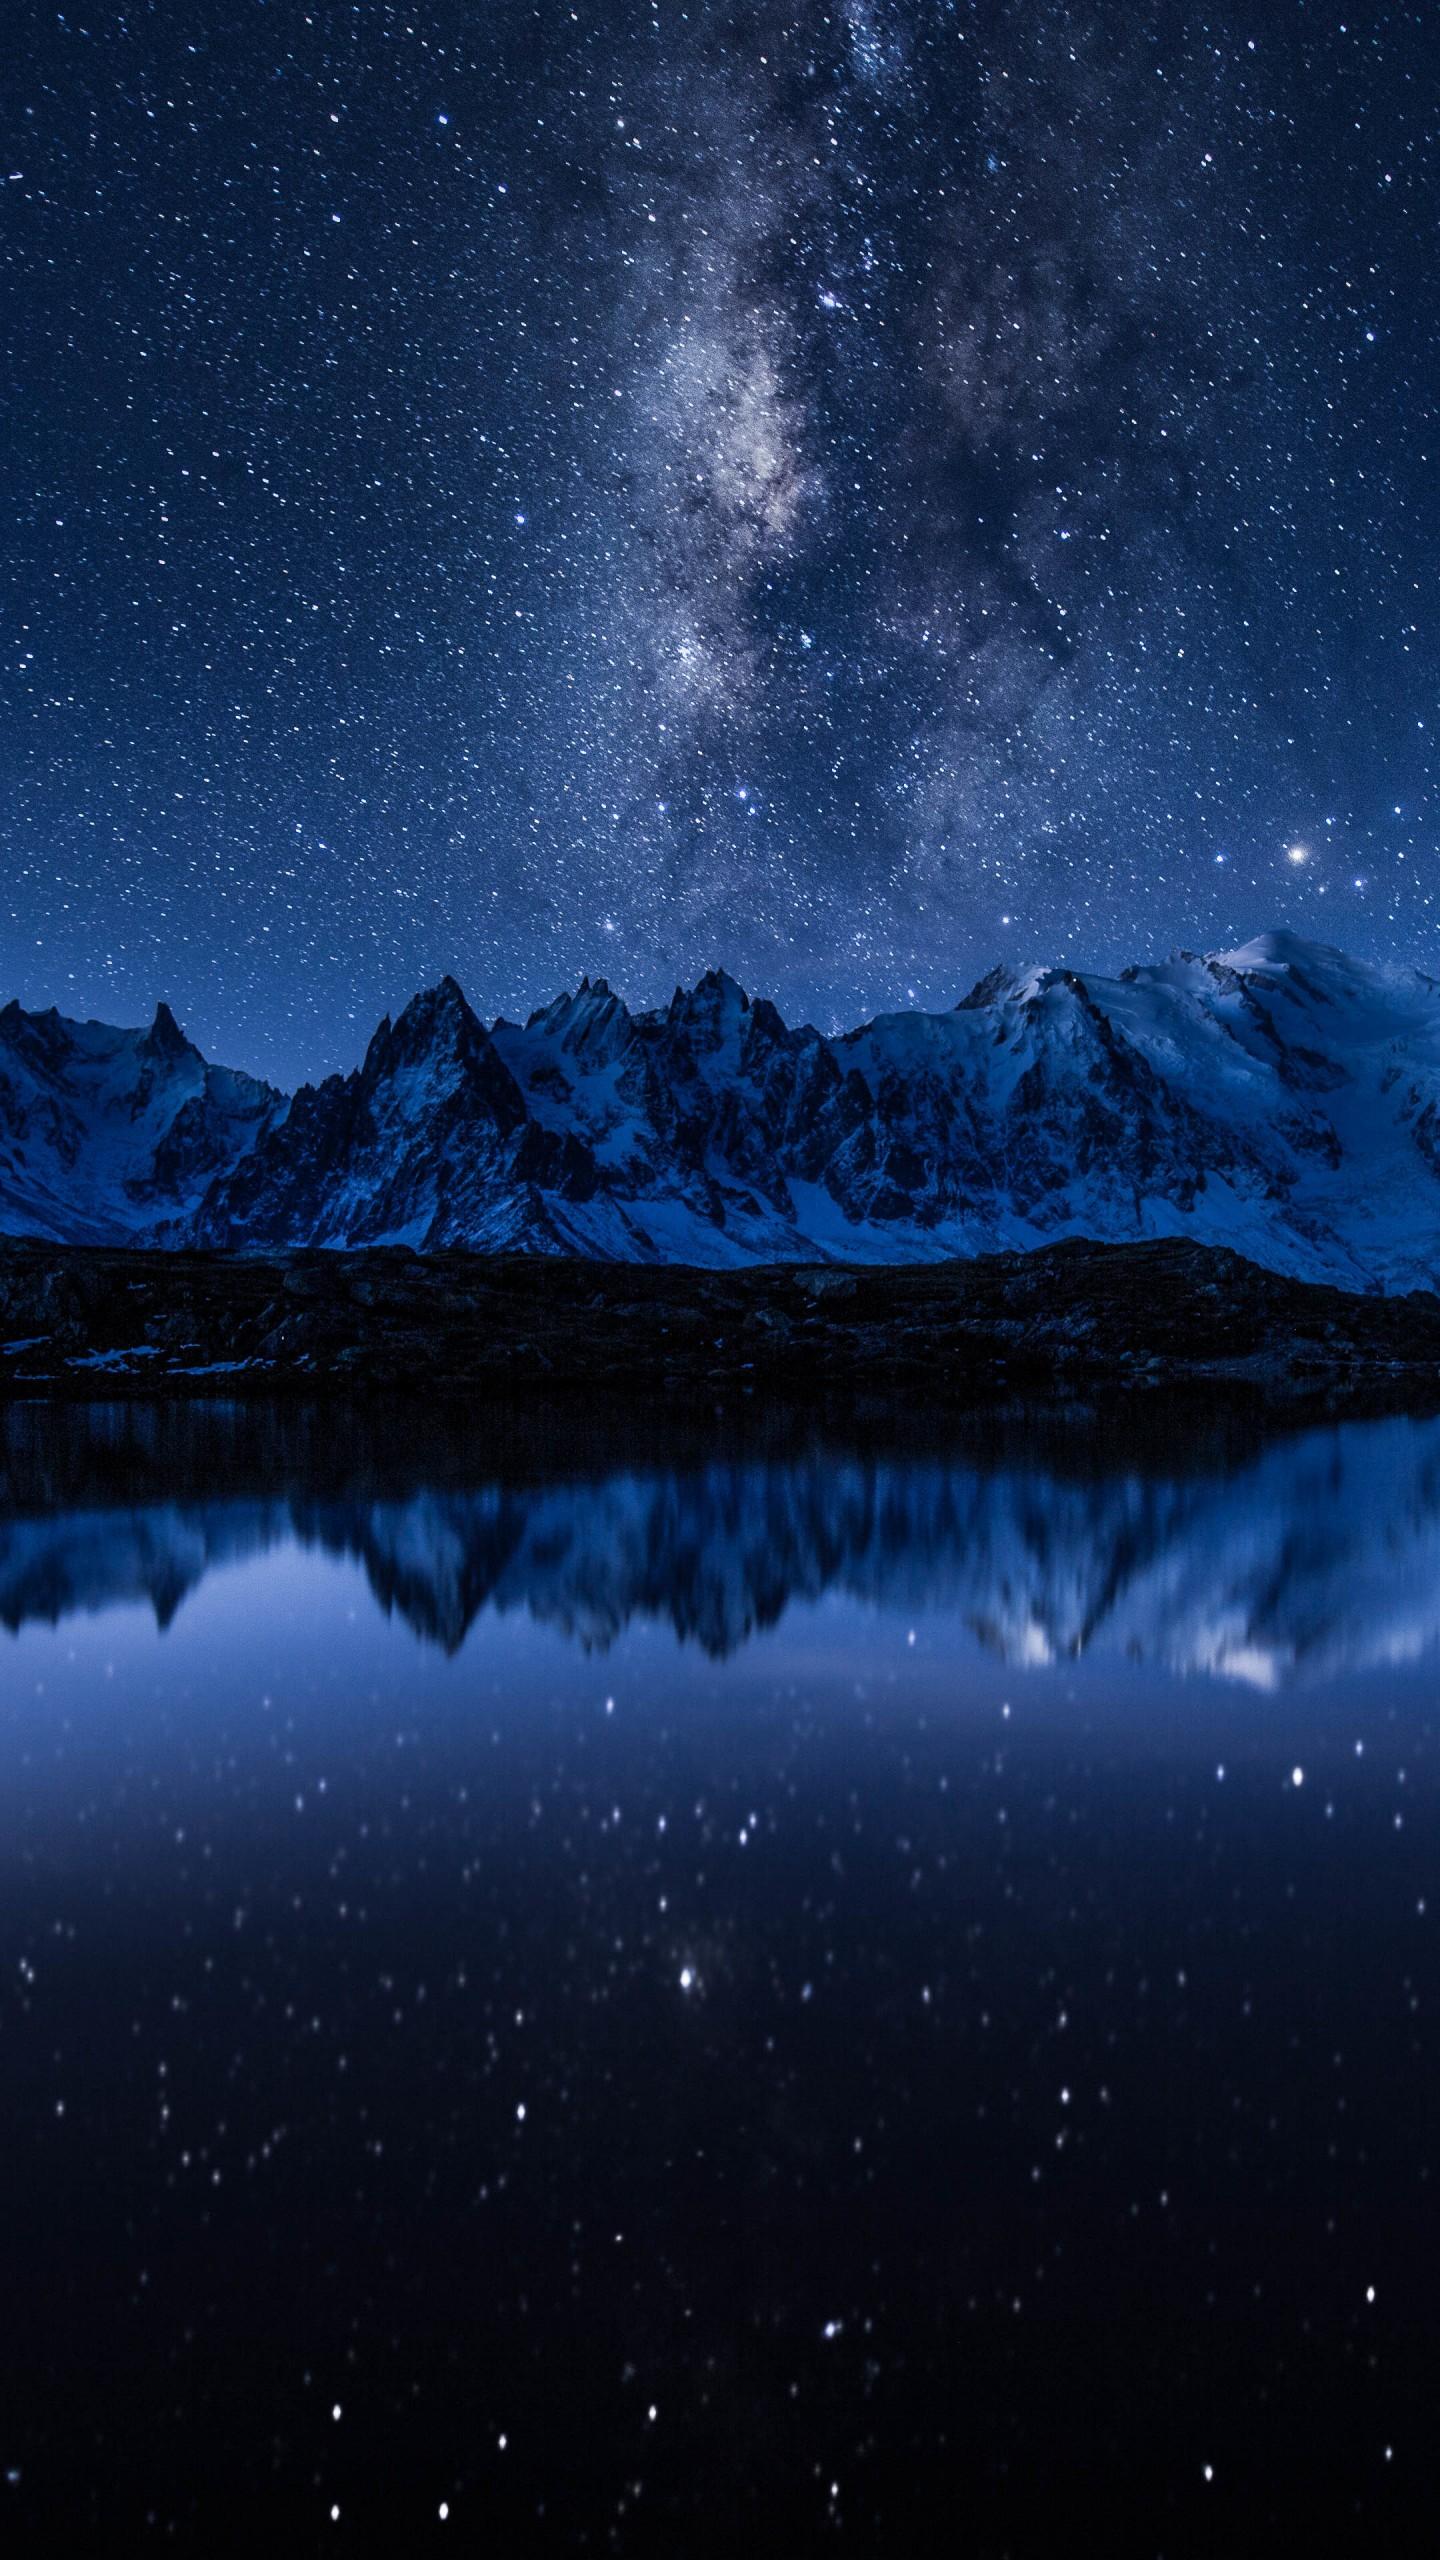 Anime Cellphone Wallpaper Wallpaper Stars Mountains Lake 5k Space 17391